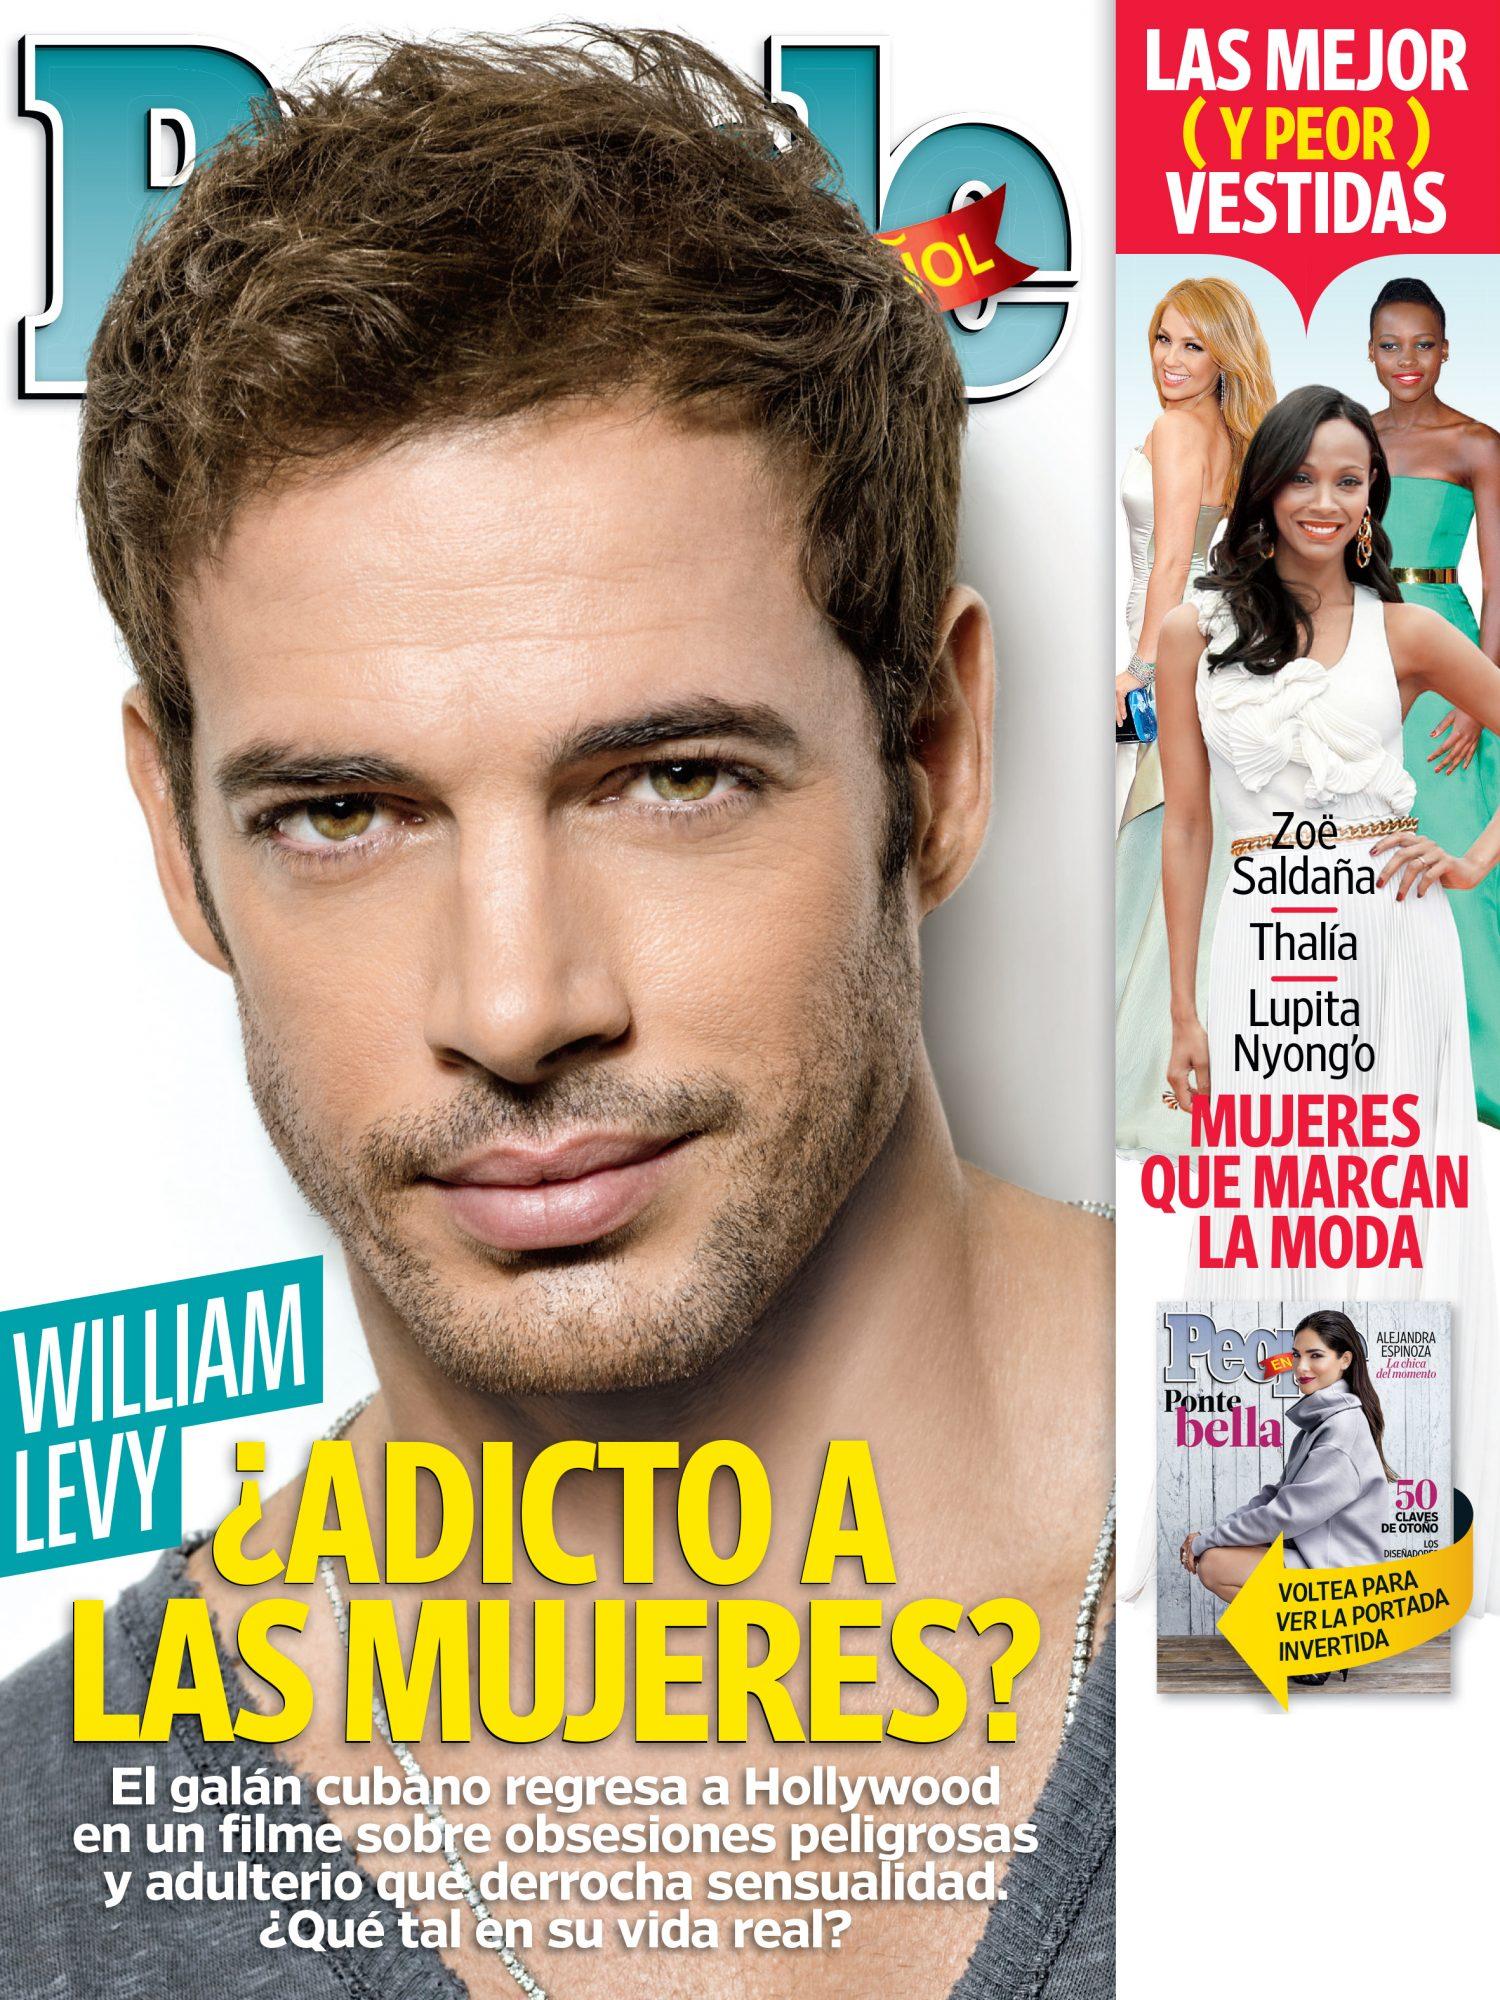 Septiembre 2014 portada – Las 25 Mujeres Mas Poderosas Cover William Levy